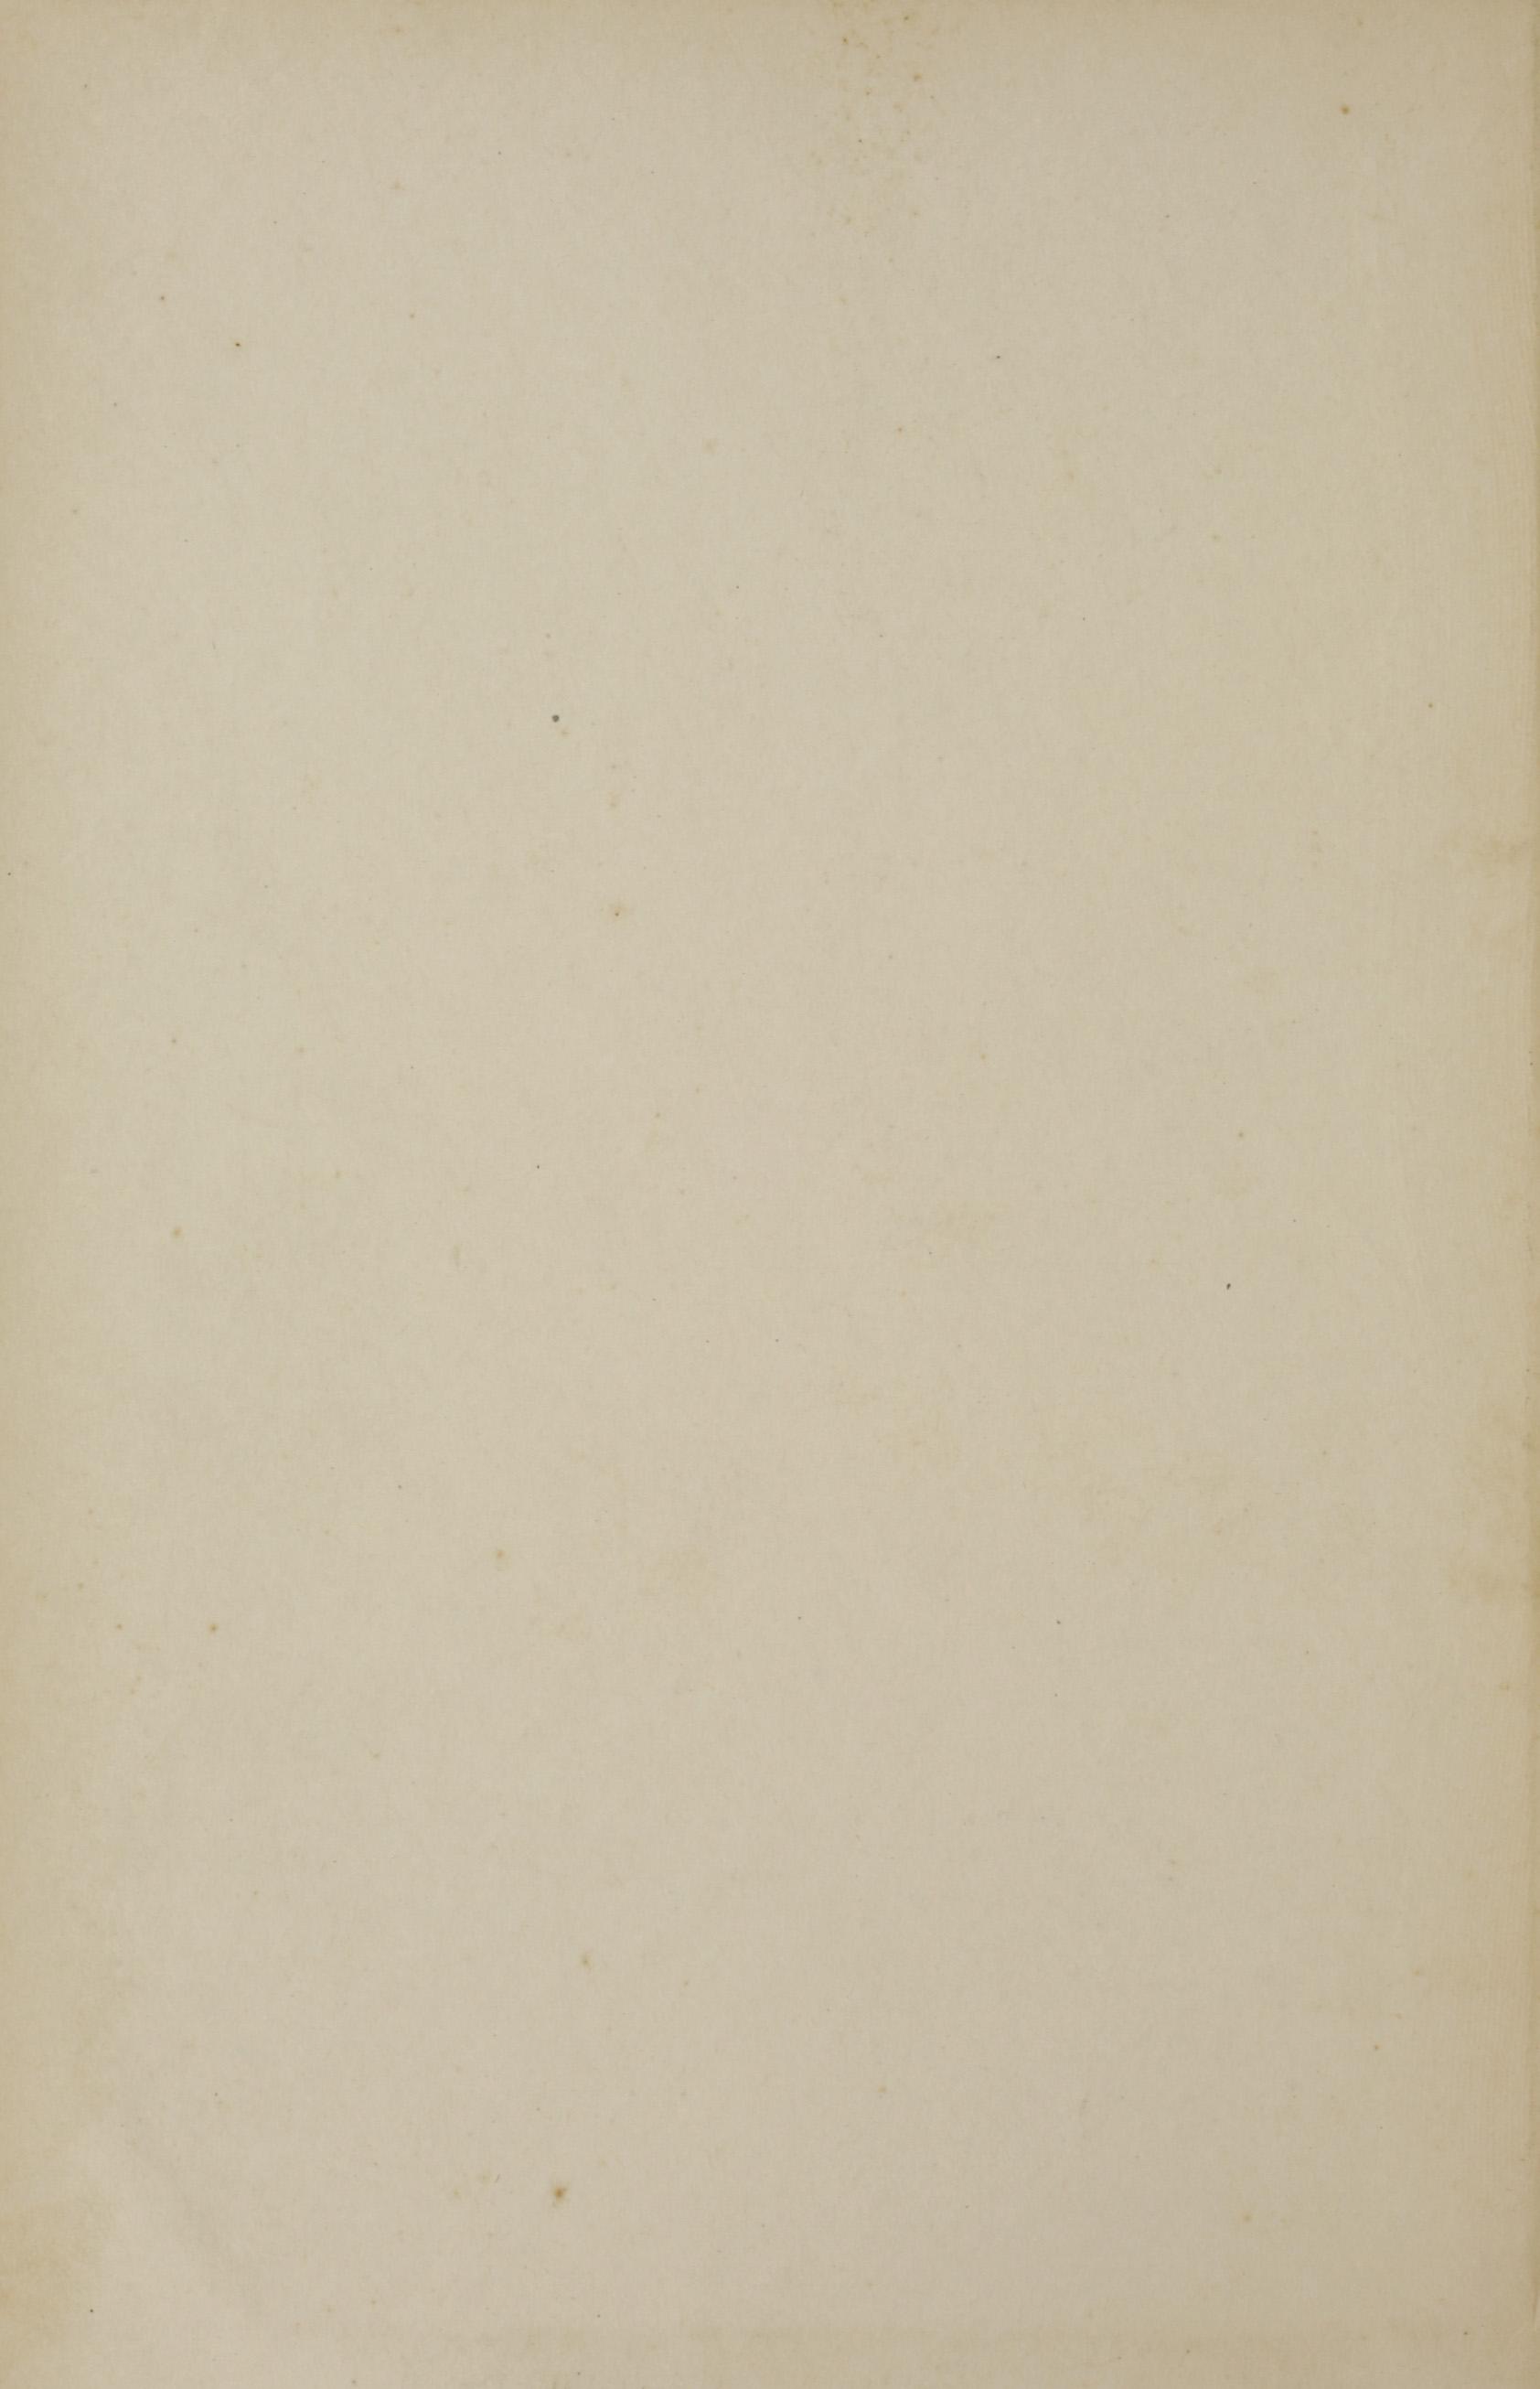 Charleston Yearbook, 1928, inside cover